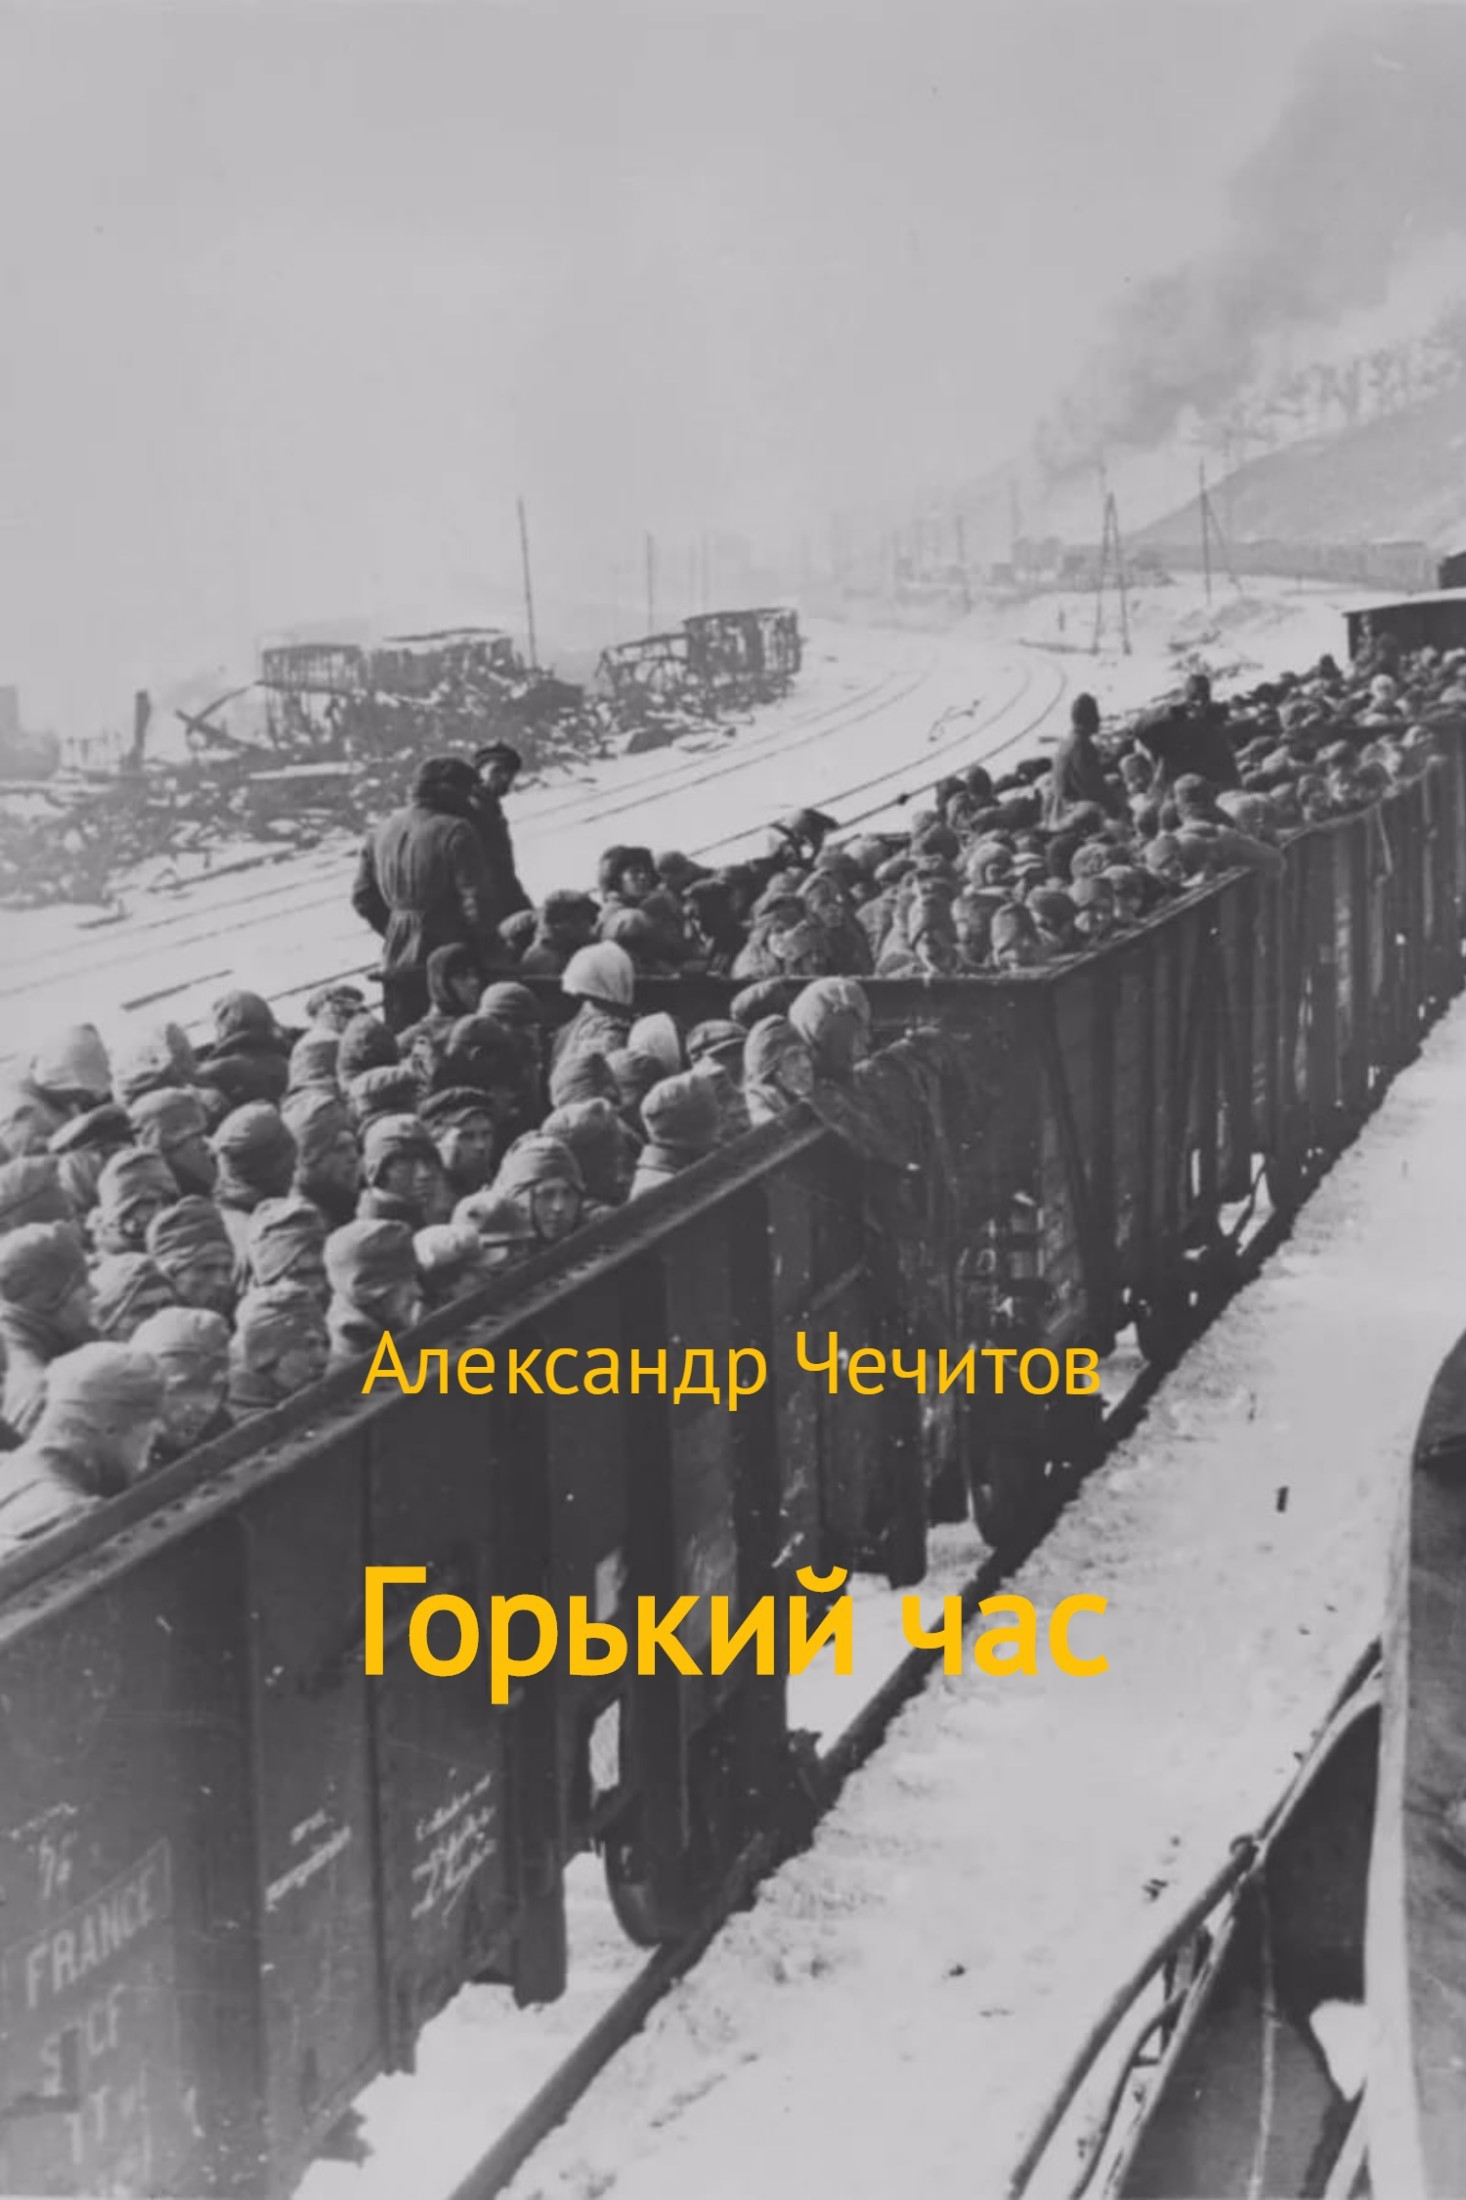 Александр Александрович Чечитов бесплатно